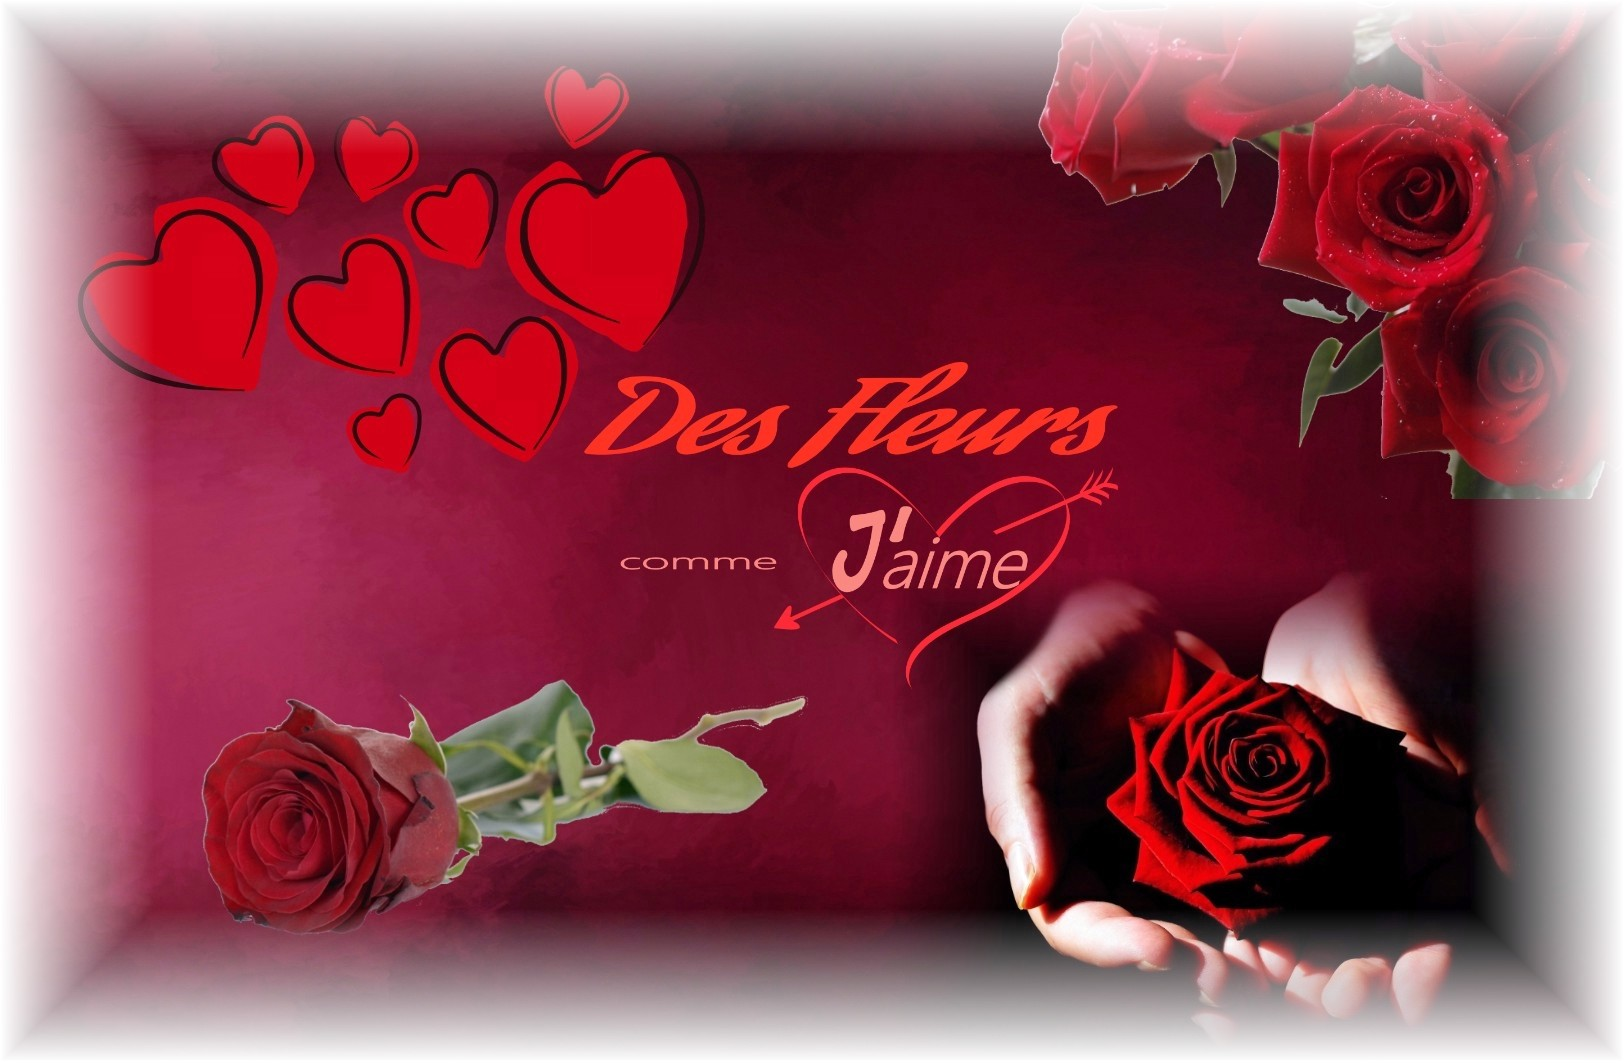 ROSE ROUGE - FLEURS SAINT VALENTIN - ROSES SAINT VALENTIN